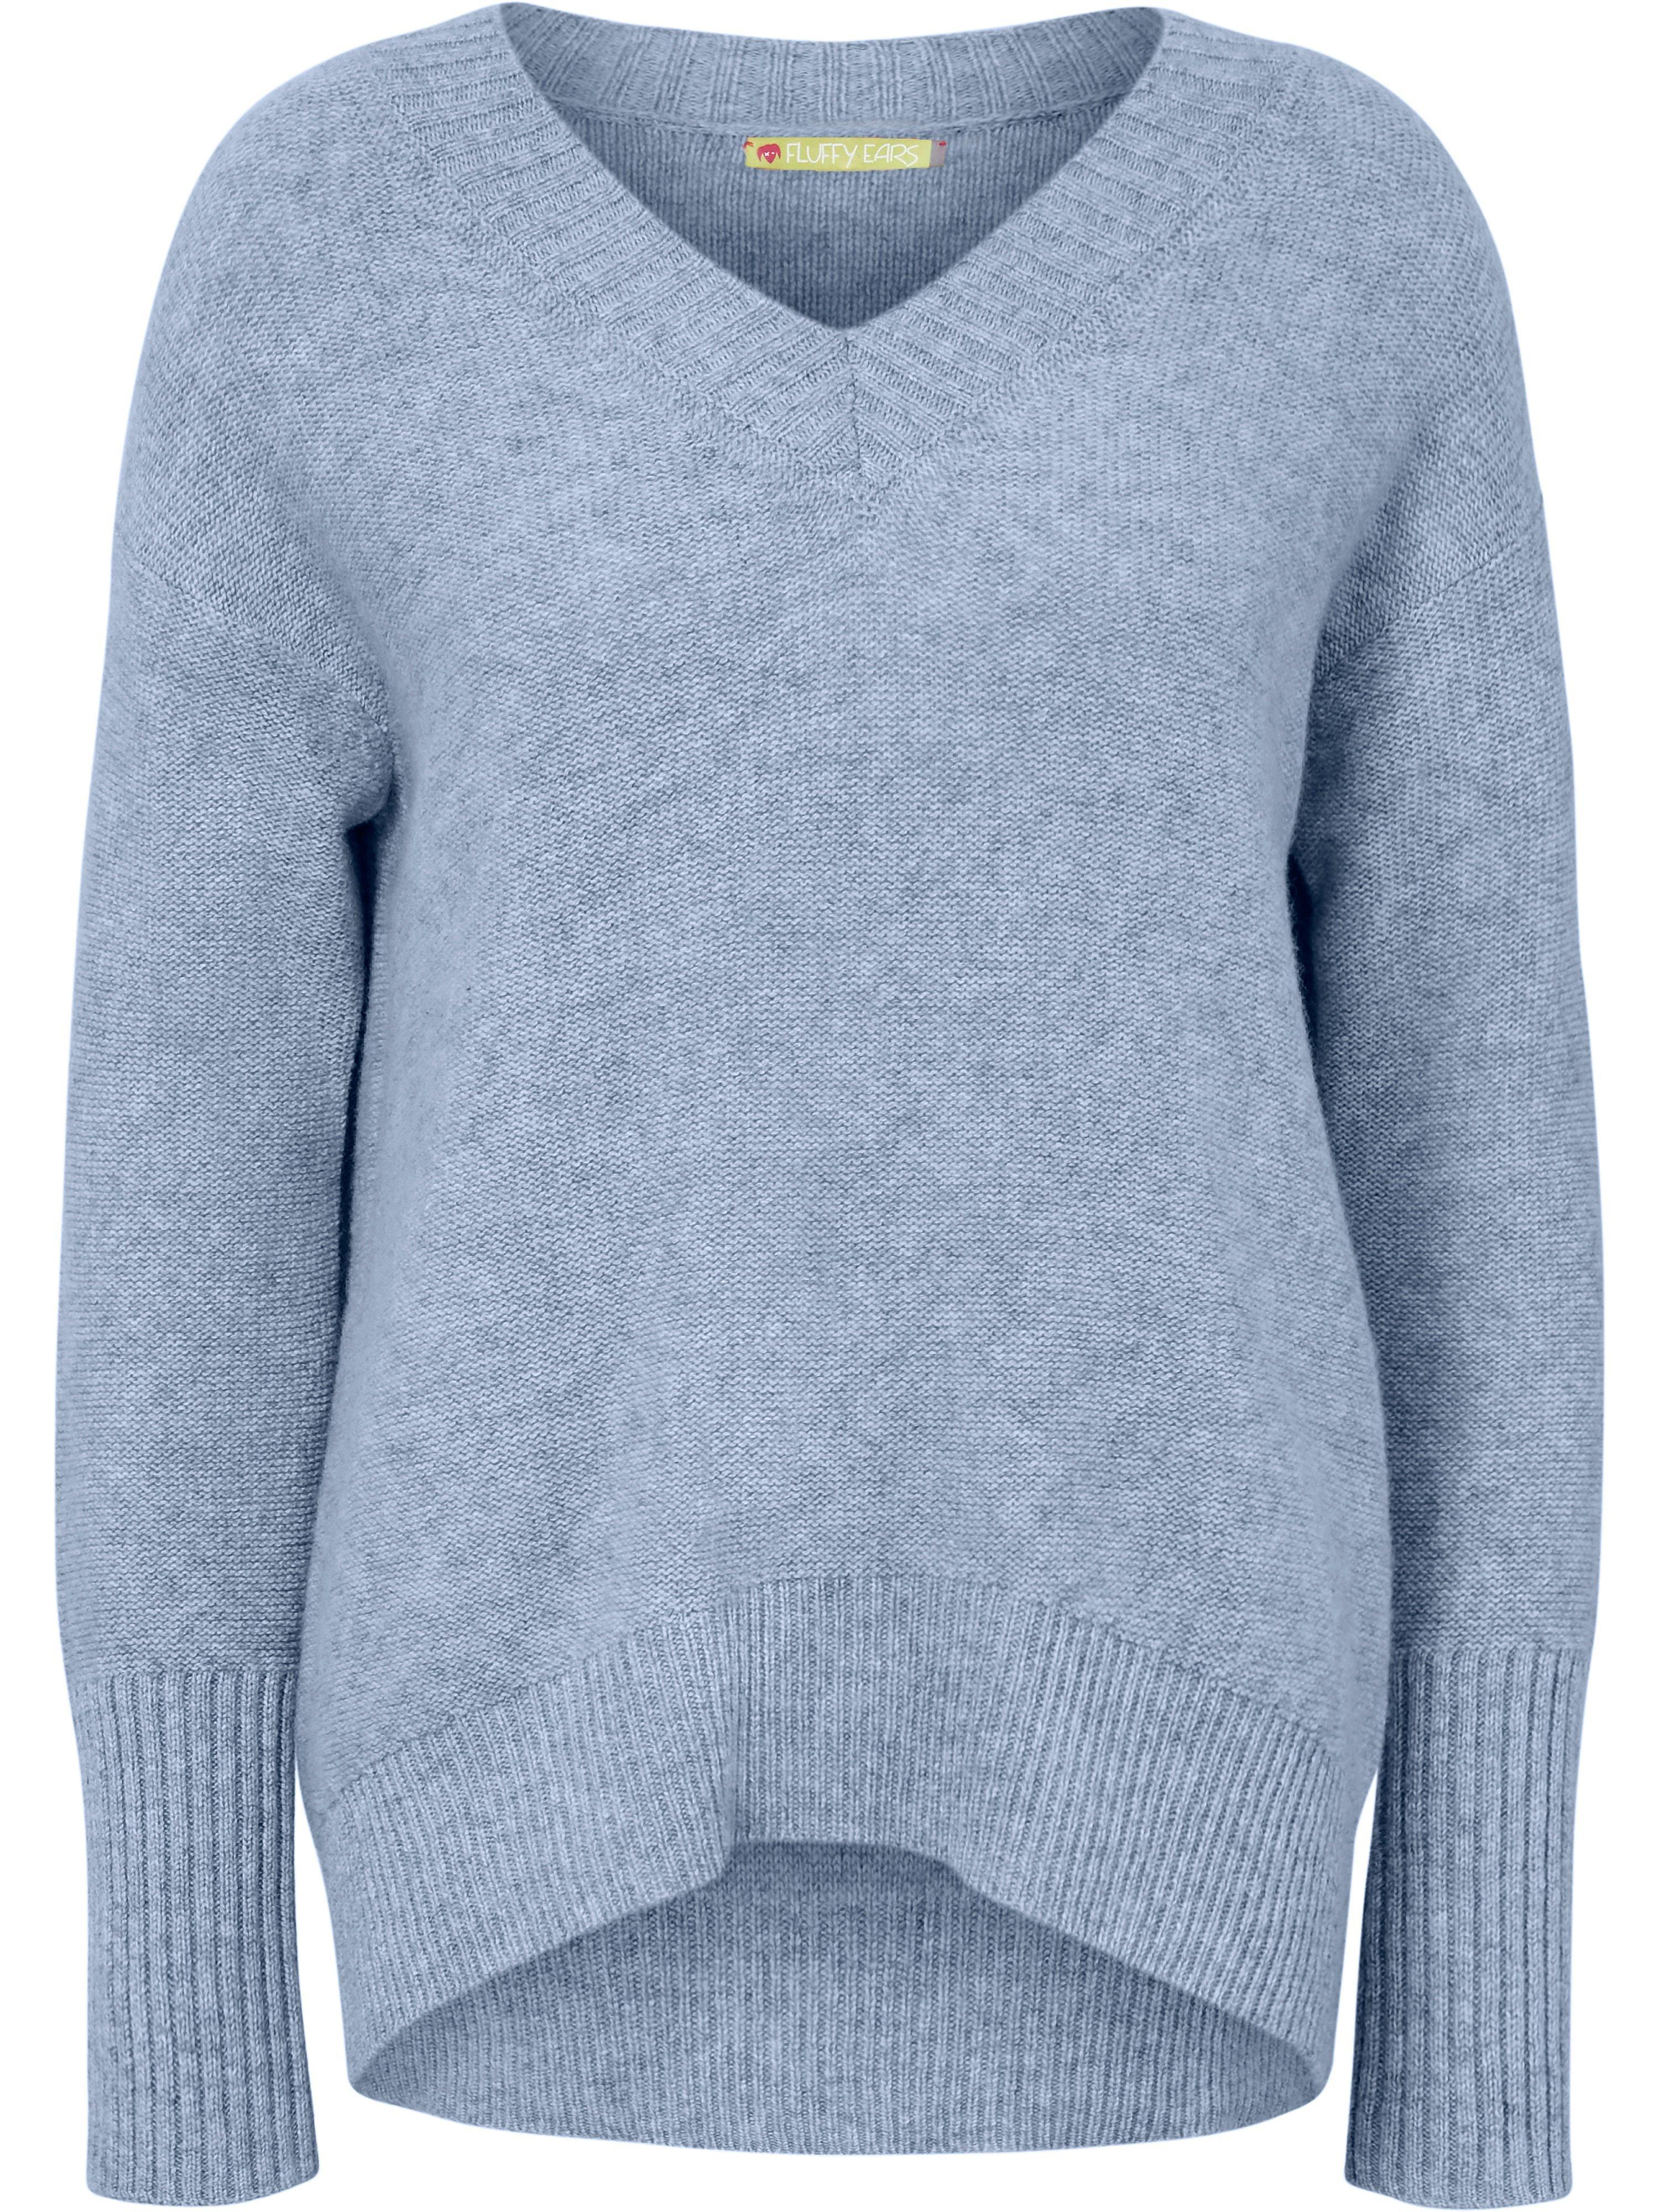 V-Pullover aus 100% Kaschmir FLUFFY EARS blau | Bekleidung > Pullover > V-Pullover | FLUFFY EARS